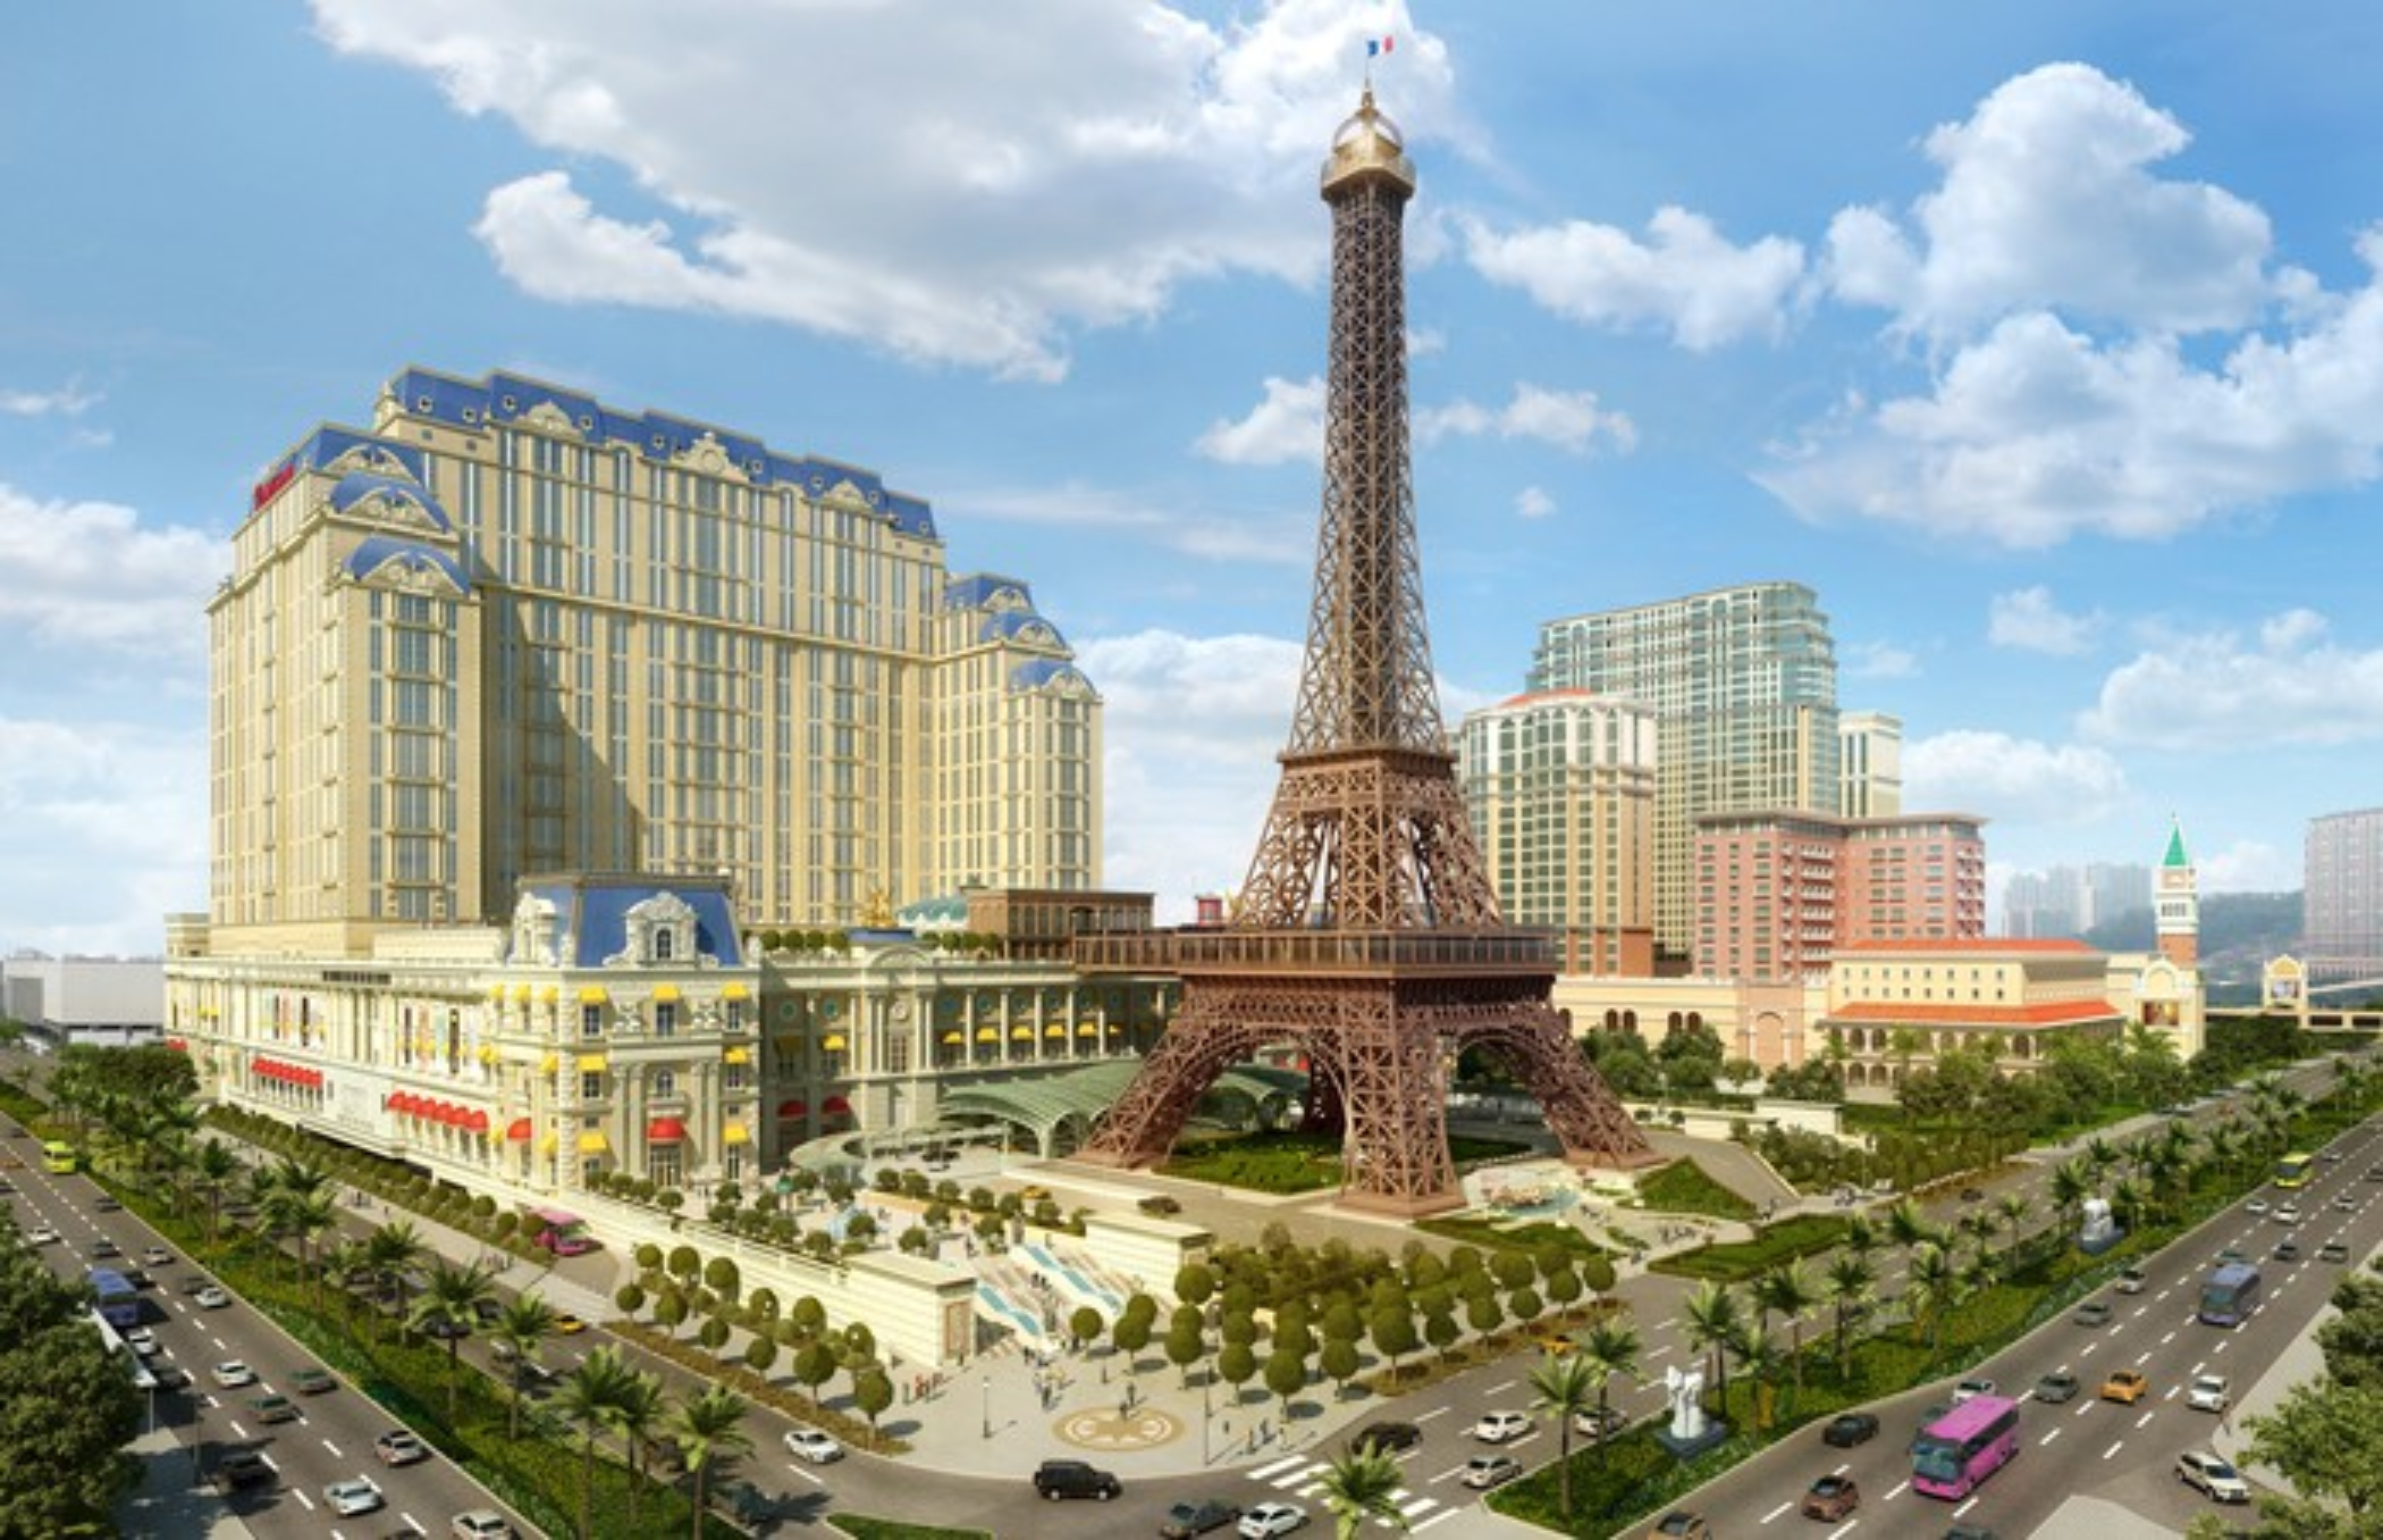 The Parisian in Macau.